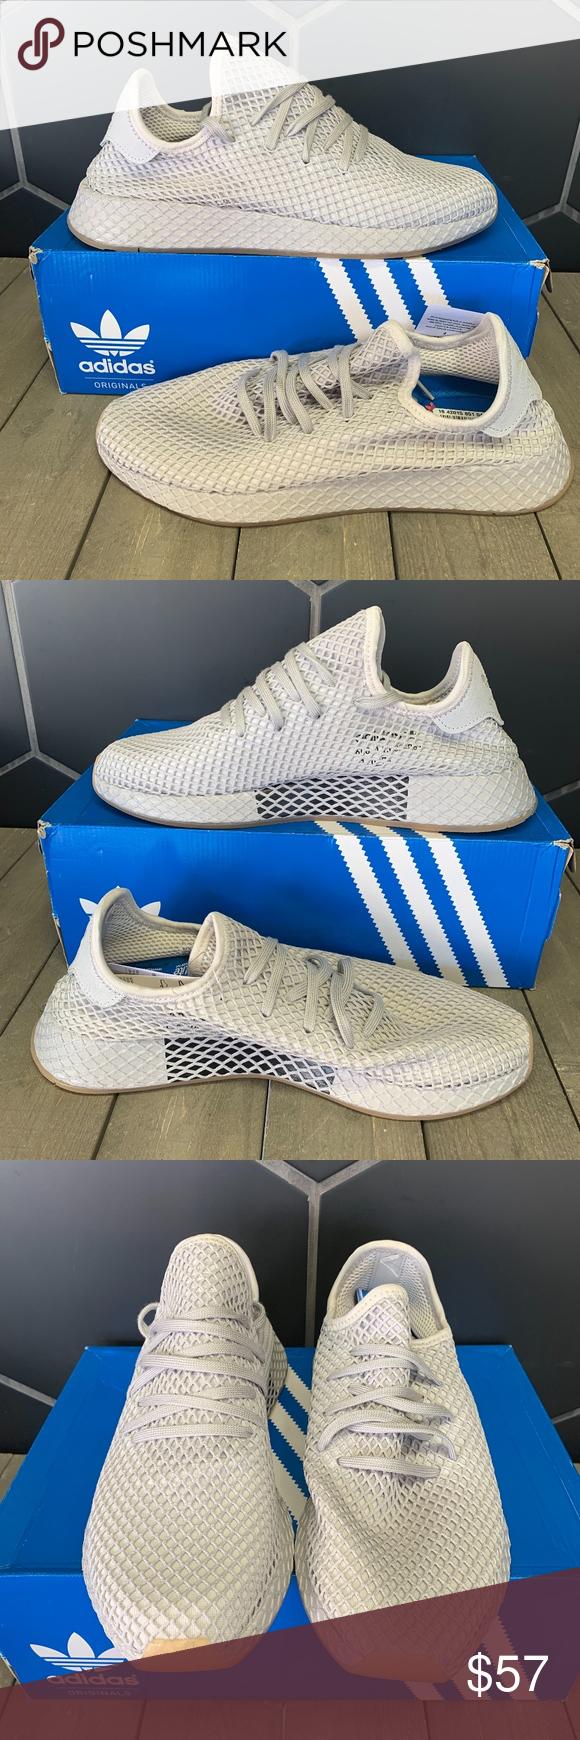 Adidas Deerupt Runner Muted Neon Light Grey Shoe New W Box